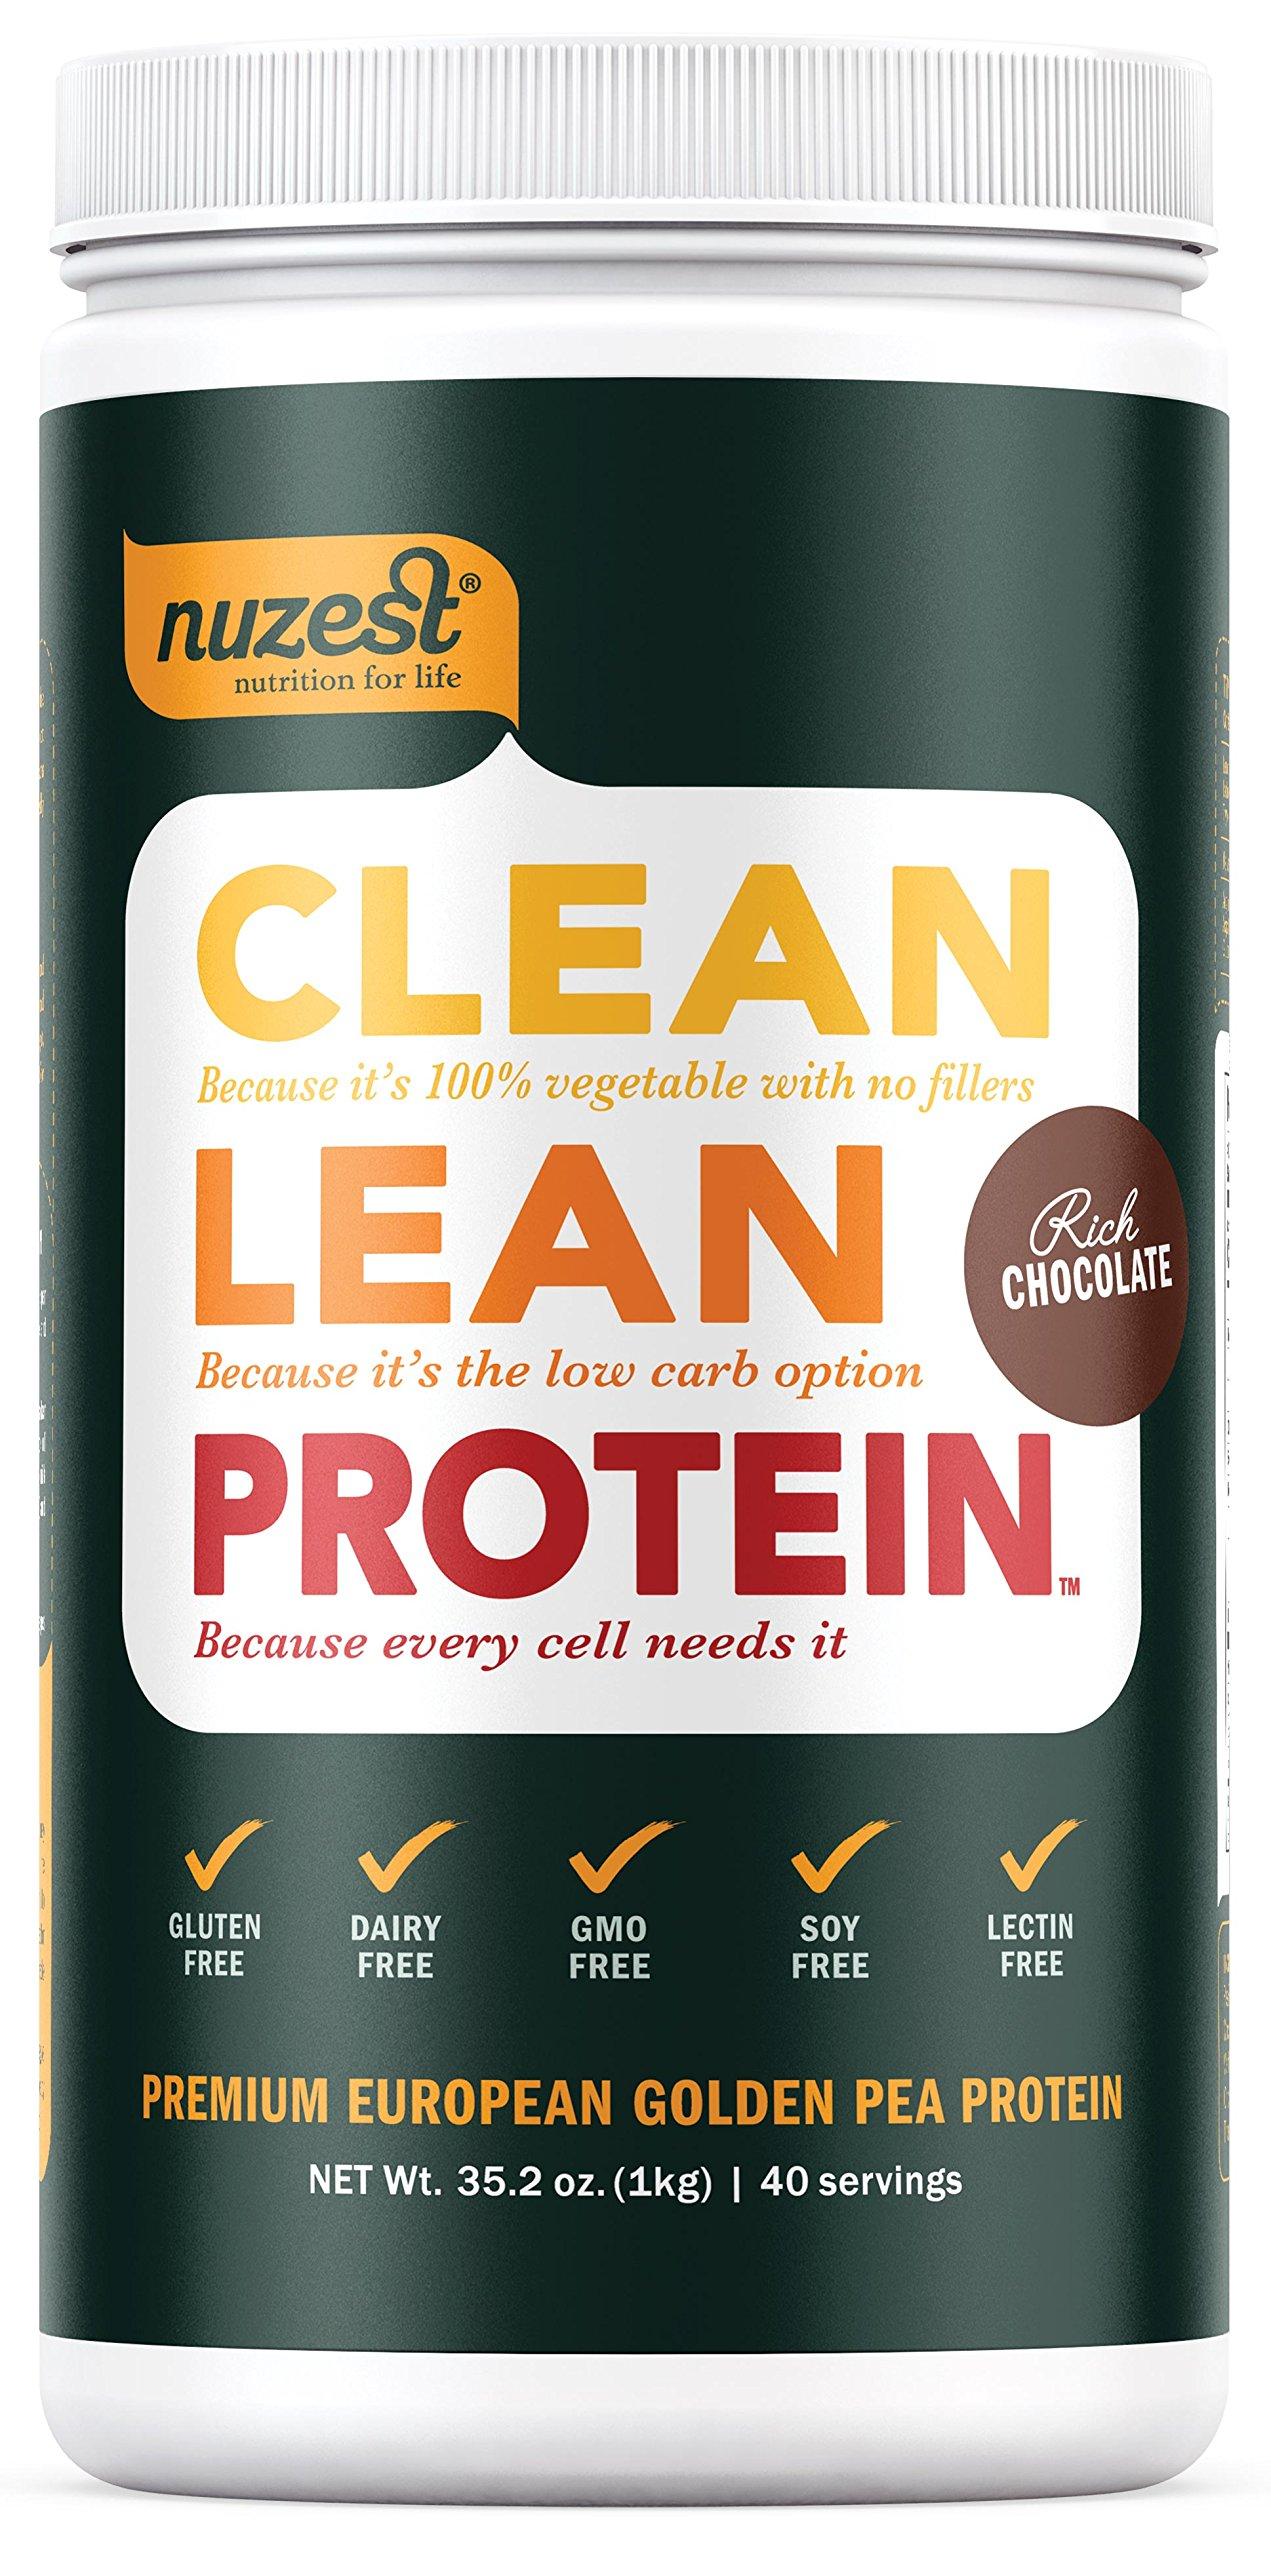 Nuzest Clean Lean Protein - Premium Vegan Protein Powder, Plant Protein Powder, European Golden Pea Protein, Dairy Free, Gluten Free, GMO Free, Naturally Sweetened, Rich Chocolate, 40 Servings, 2.2 lb